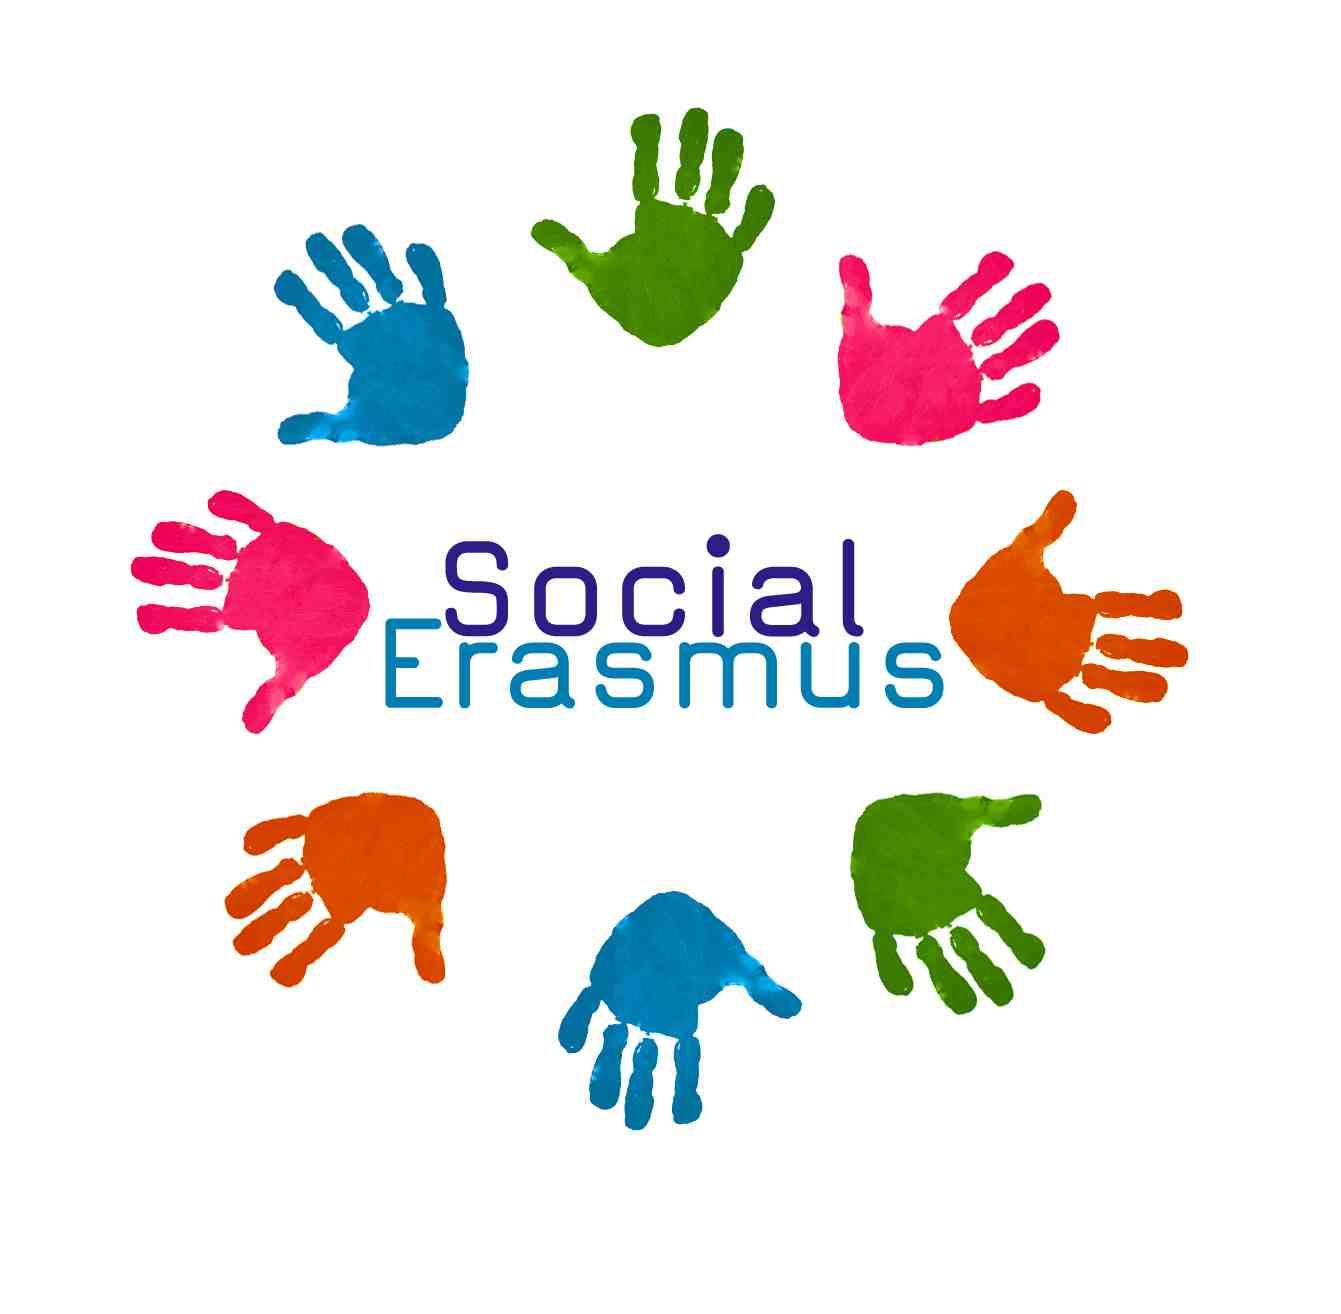 lsocial erasmus